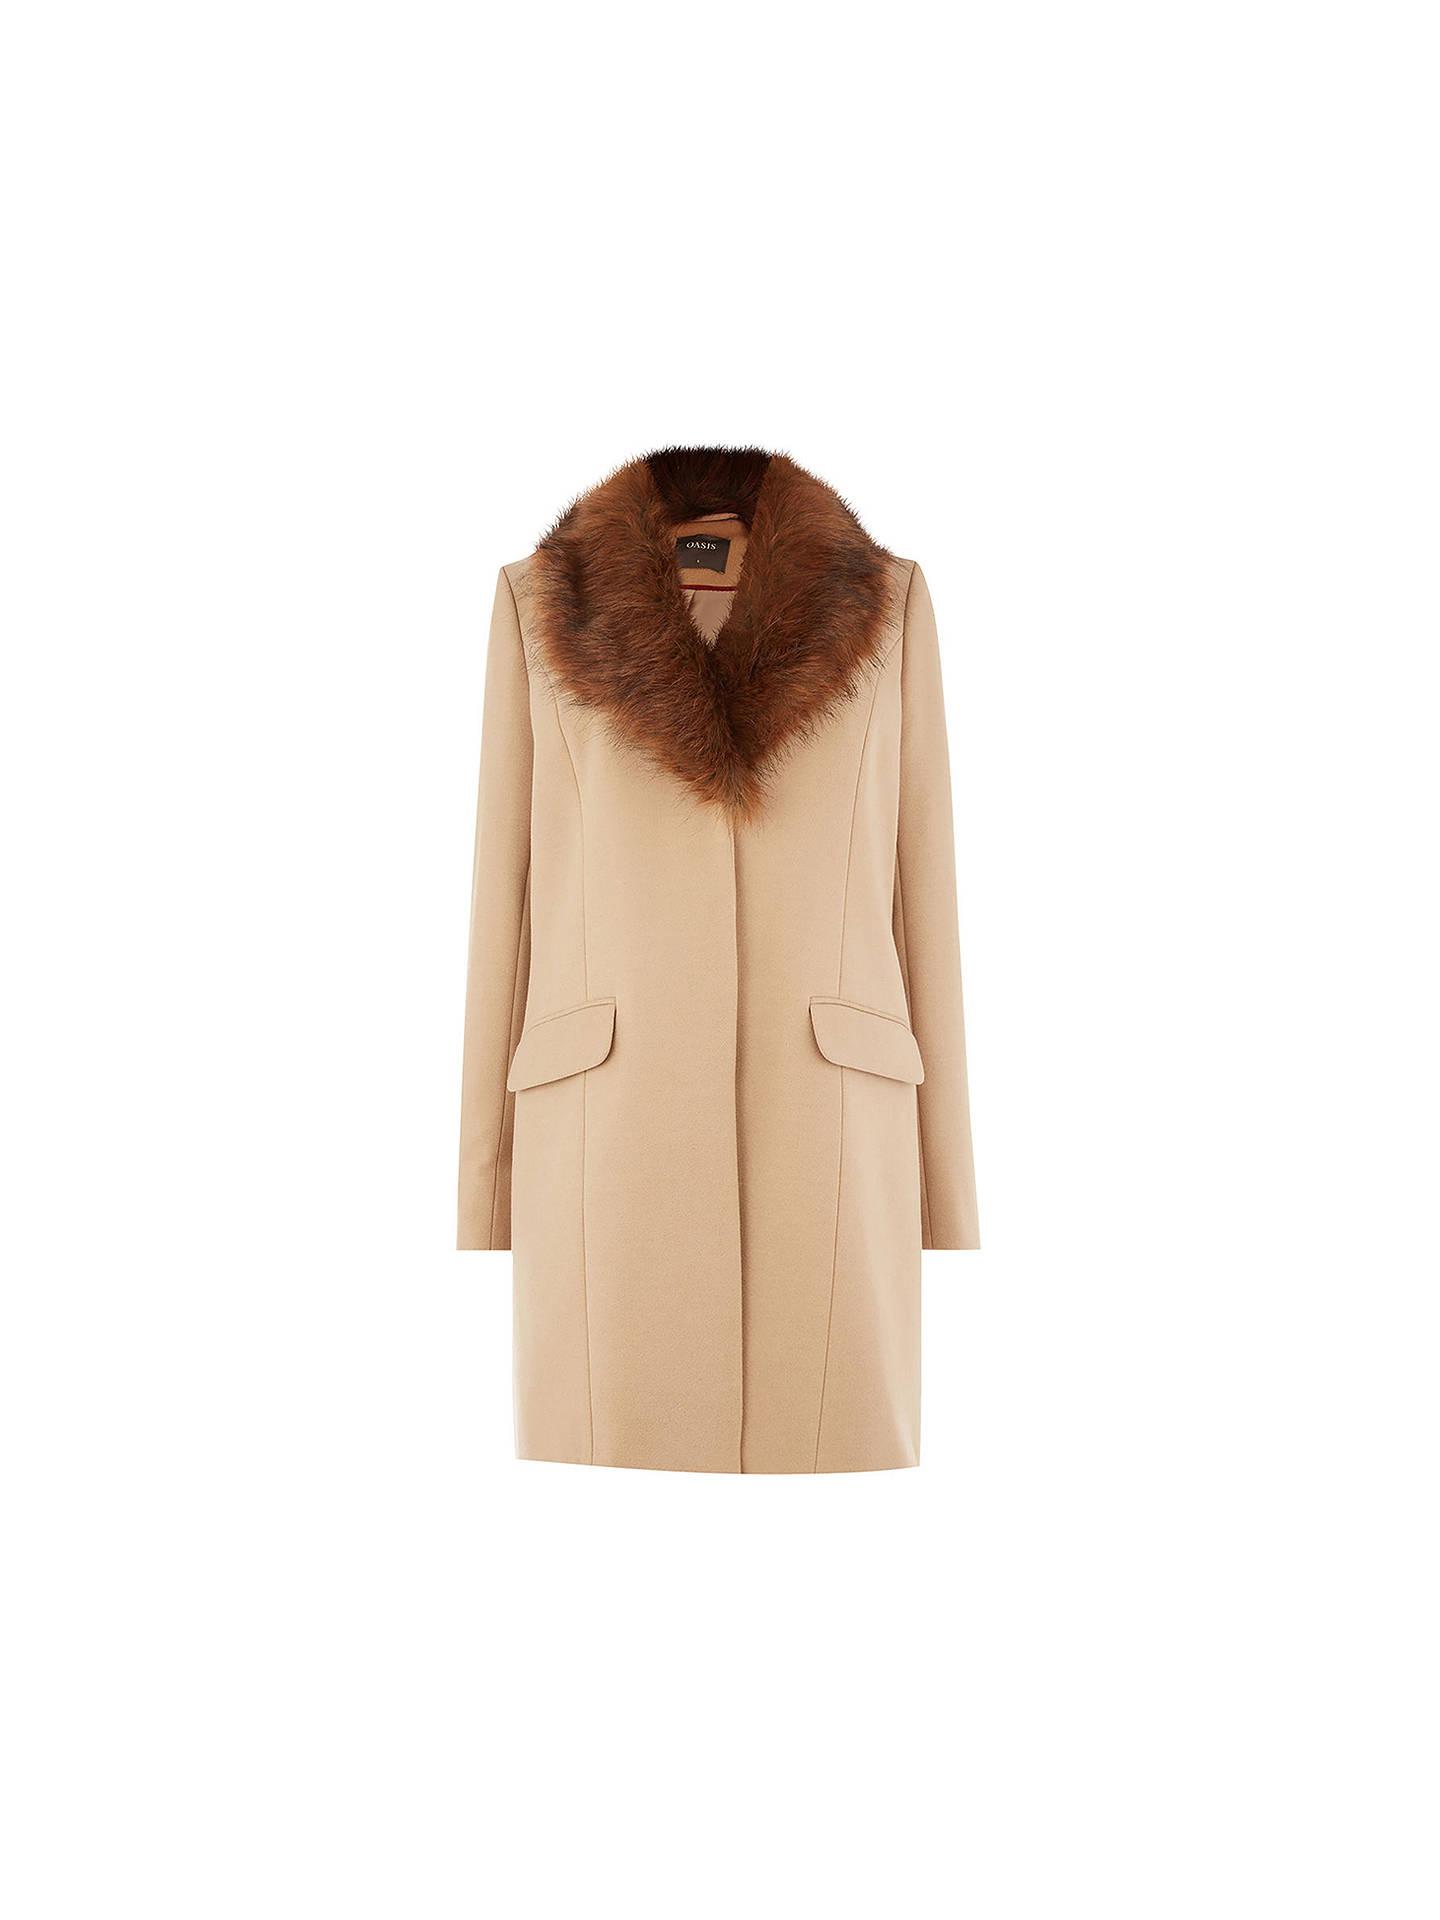 65a012a4c92f ... Buy Oasis Fran Shawl Fur Collar Coat, Tan, XS Online at johnlewis.com  ...